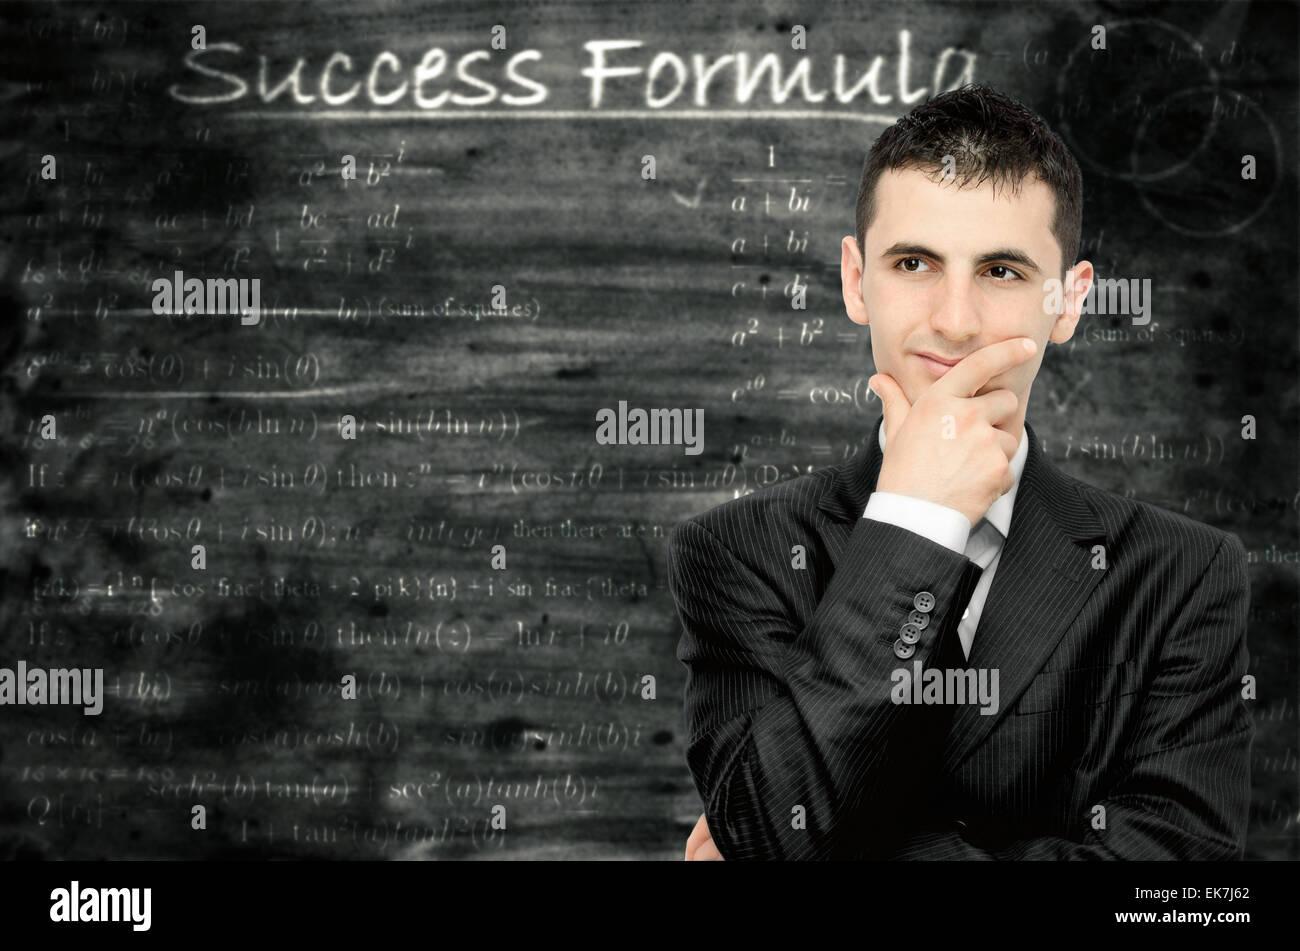 Success formula - Stock Image